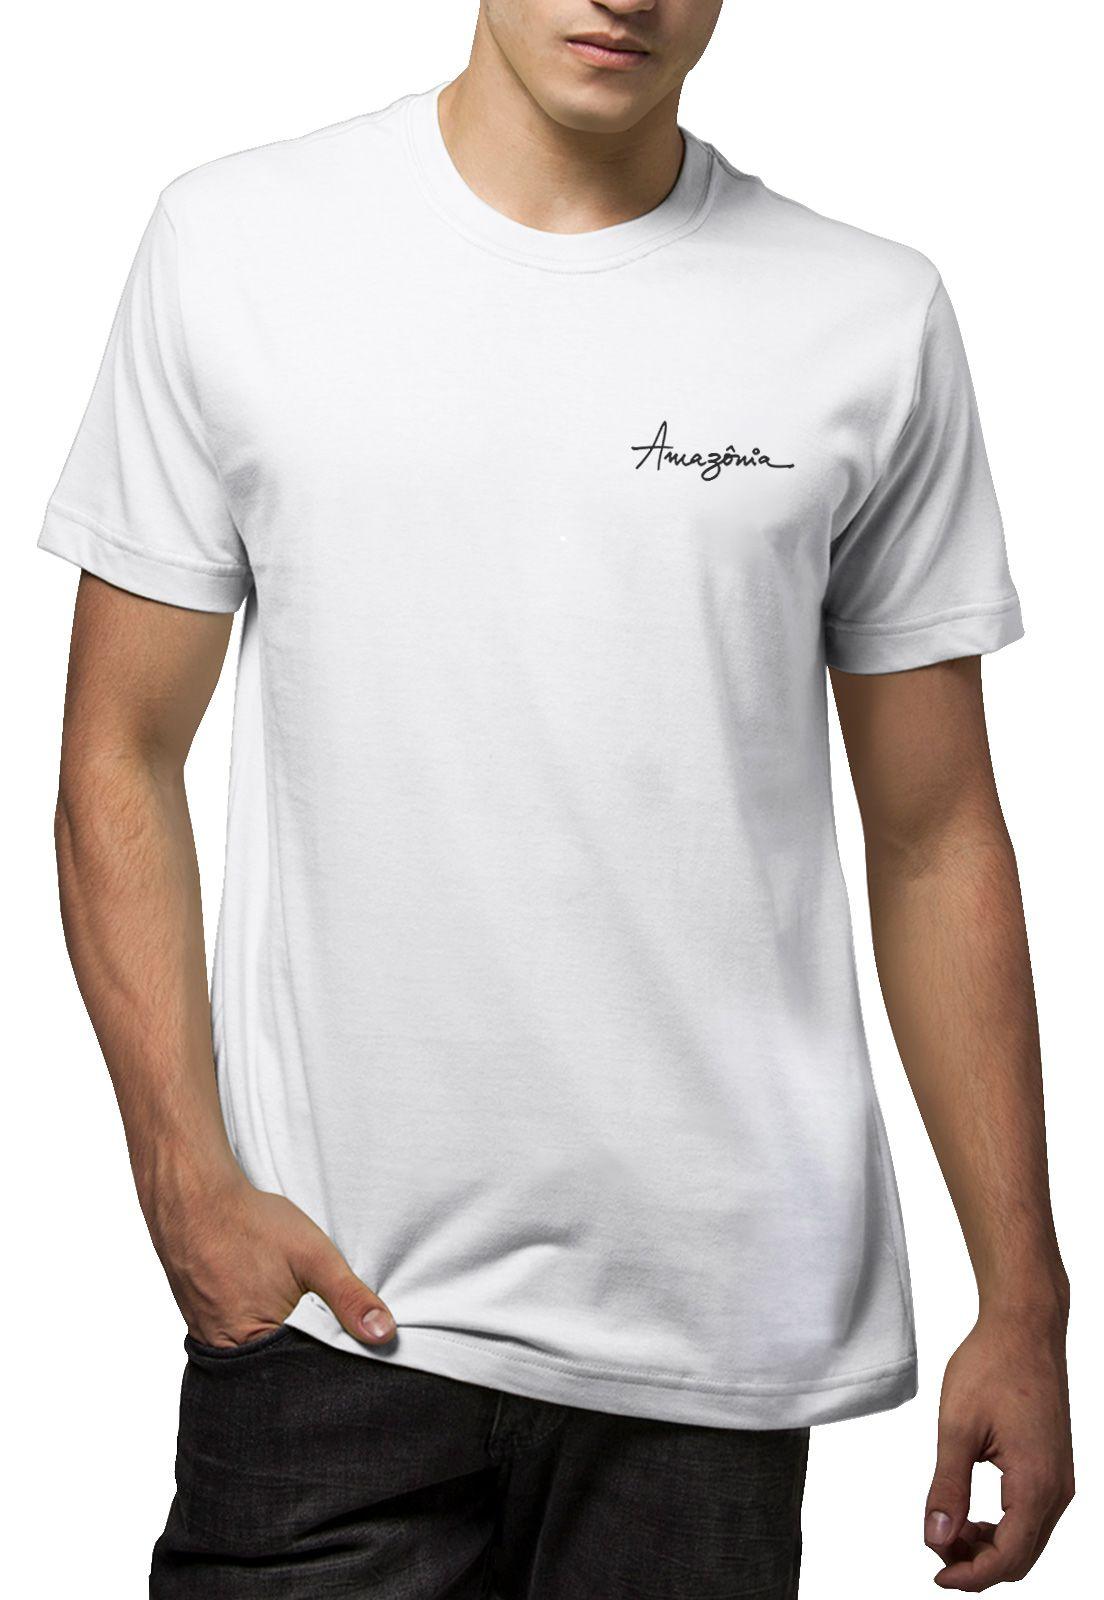 Camiseta Amazônia Arara Brasileira - Branco